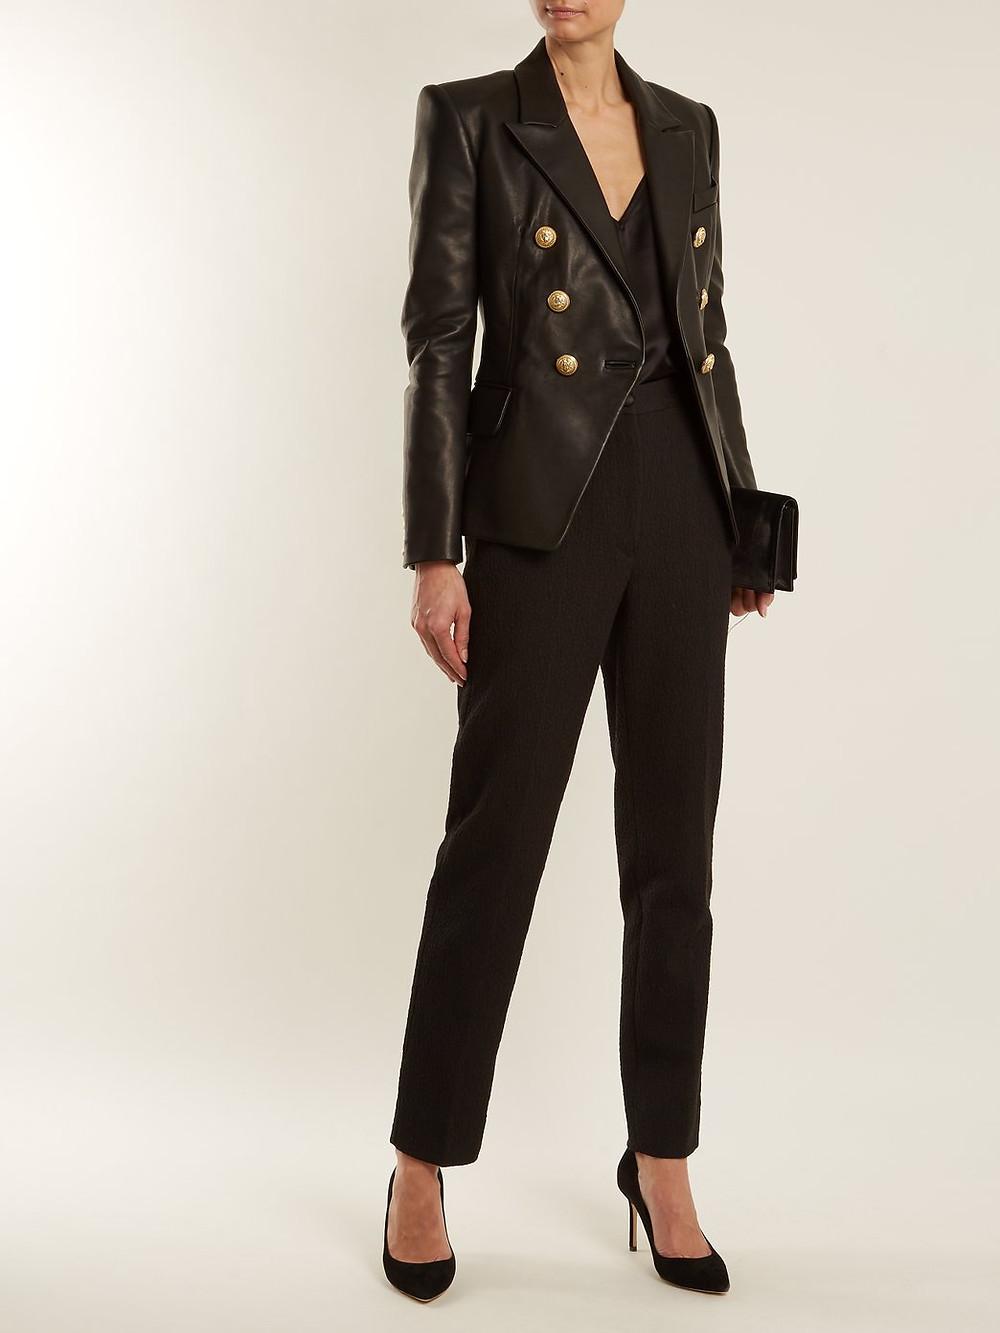 Balmain Double-breasted peak-lapel leather blazer $3,495